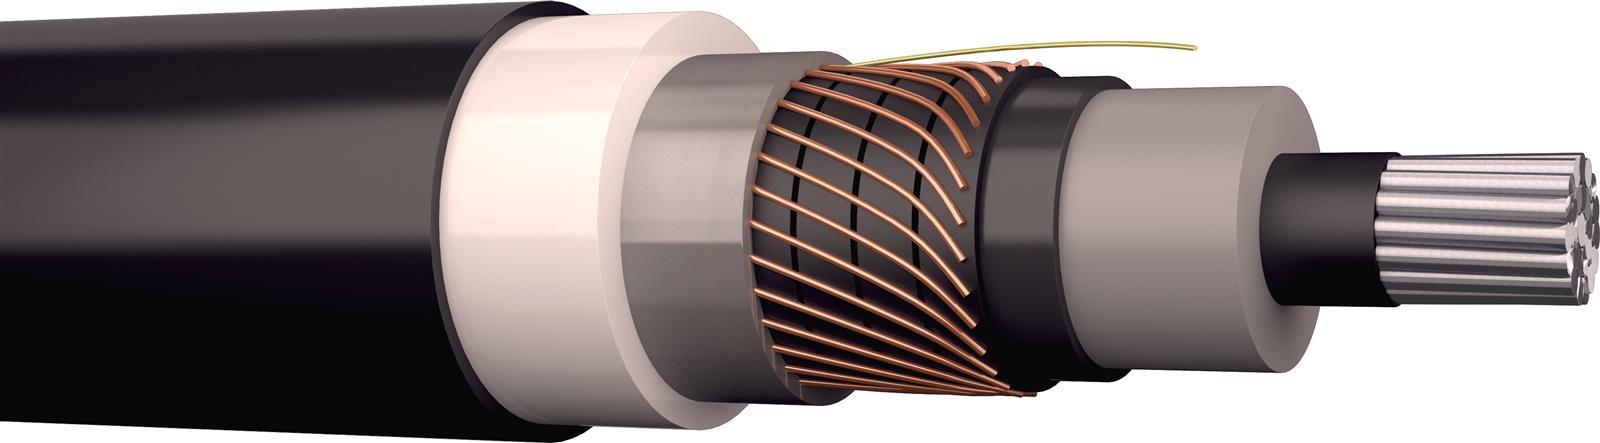 AXLJ-TTCL 1X500/35 36KV